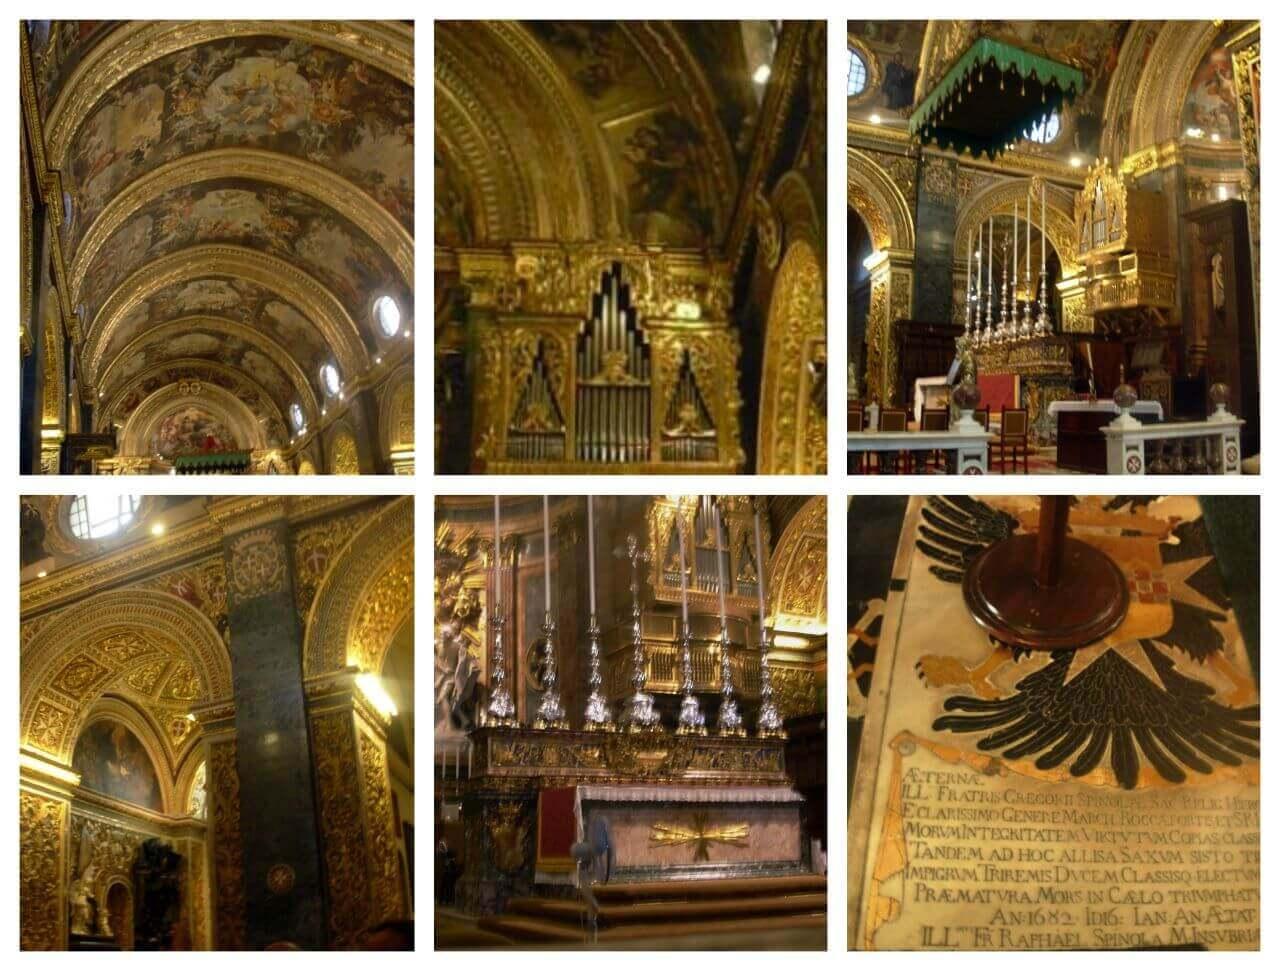 St. John Co-Cathedral, Valetta